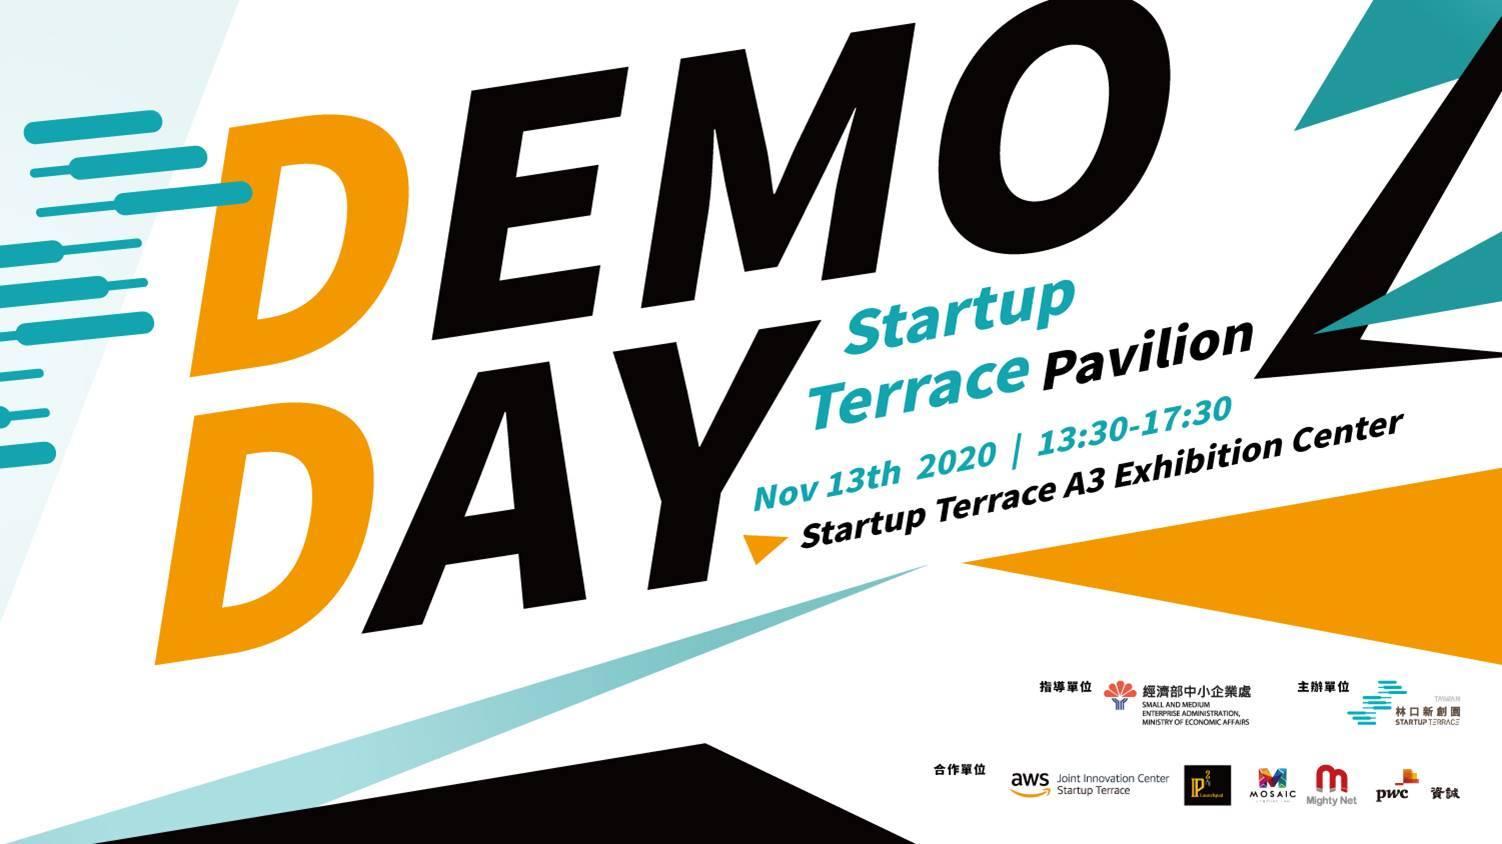 InnoVEX 2020 Startup Terrace Pavilion Demo Day